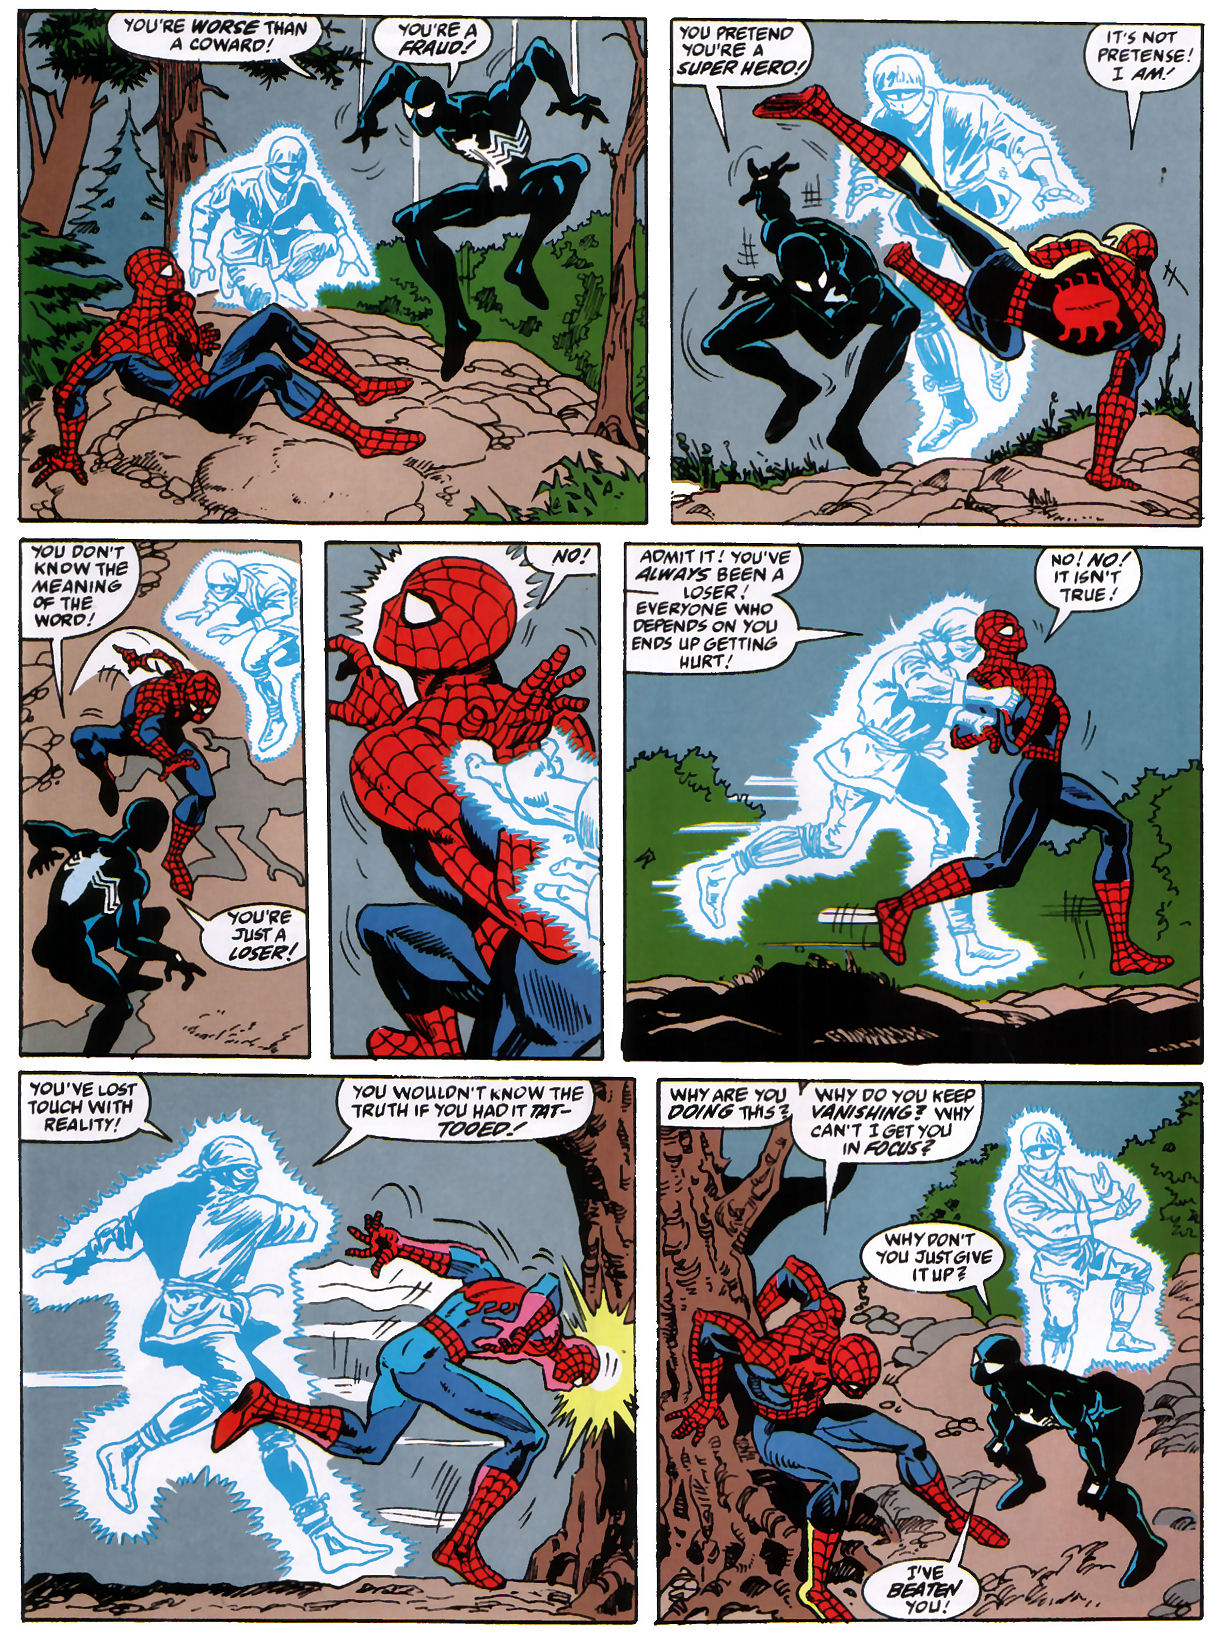 Comic Marvel Graphic Novel issue 78